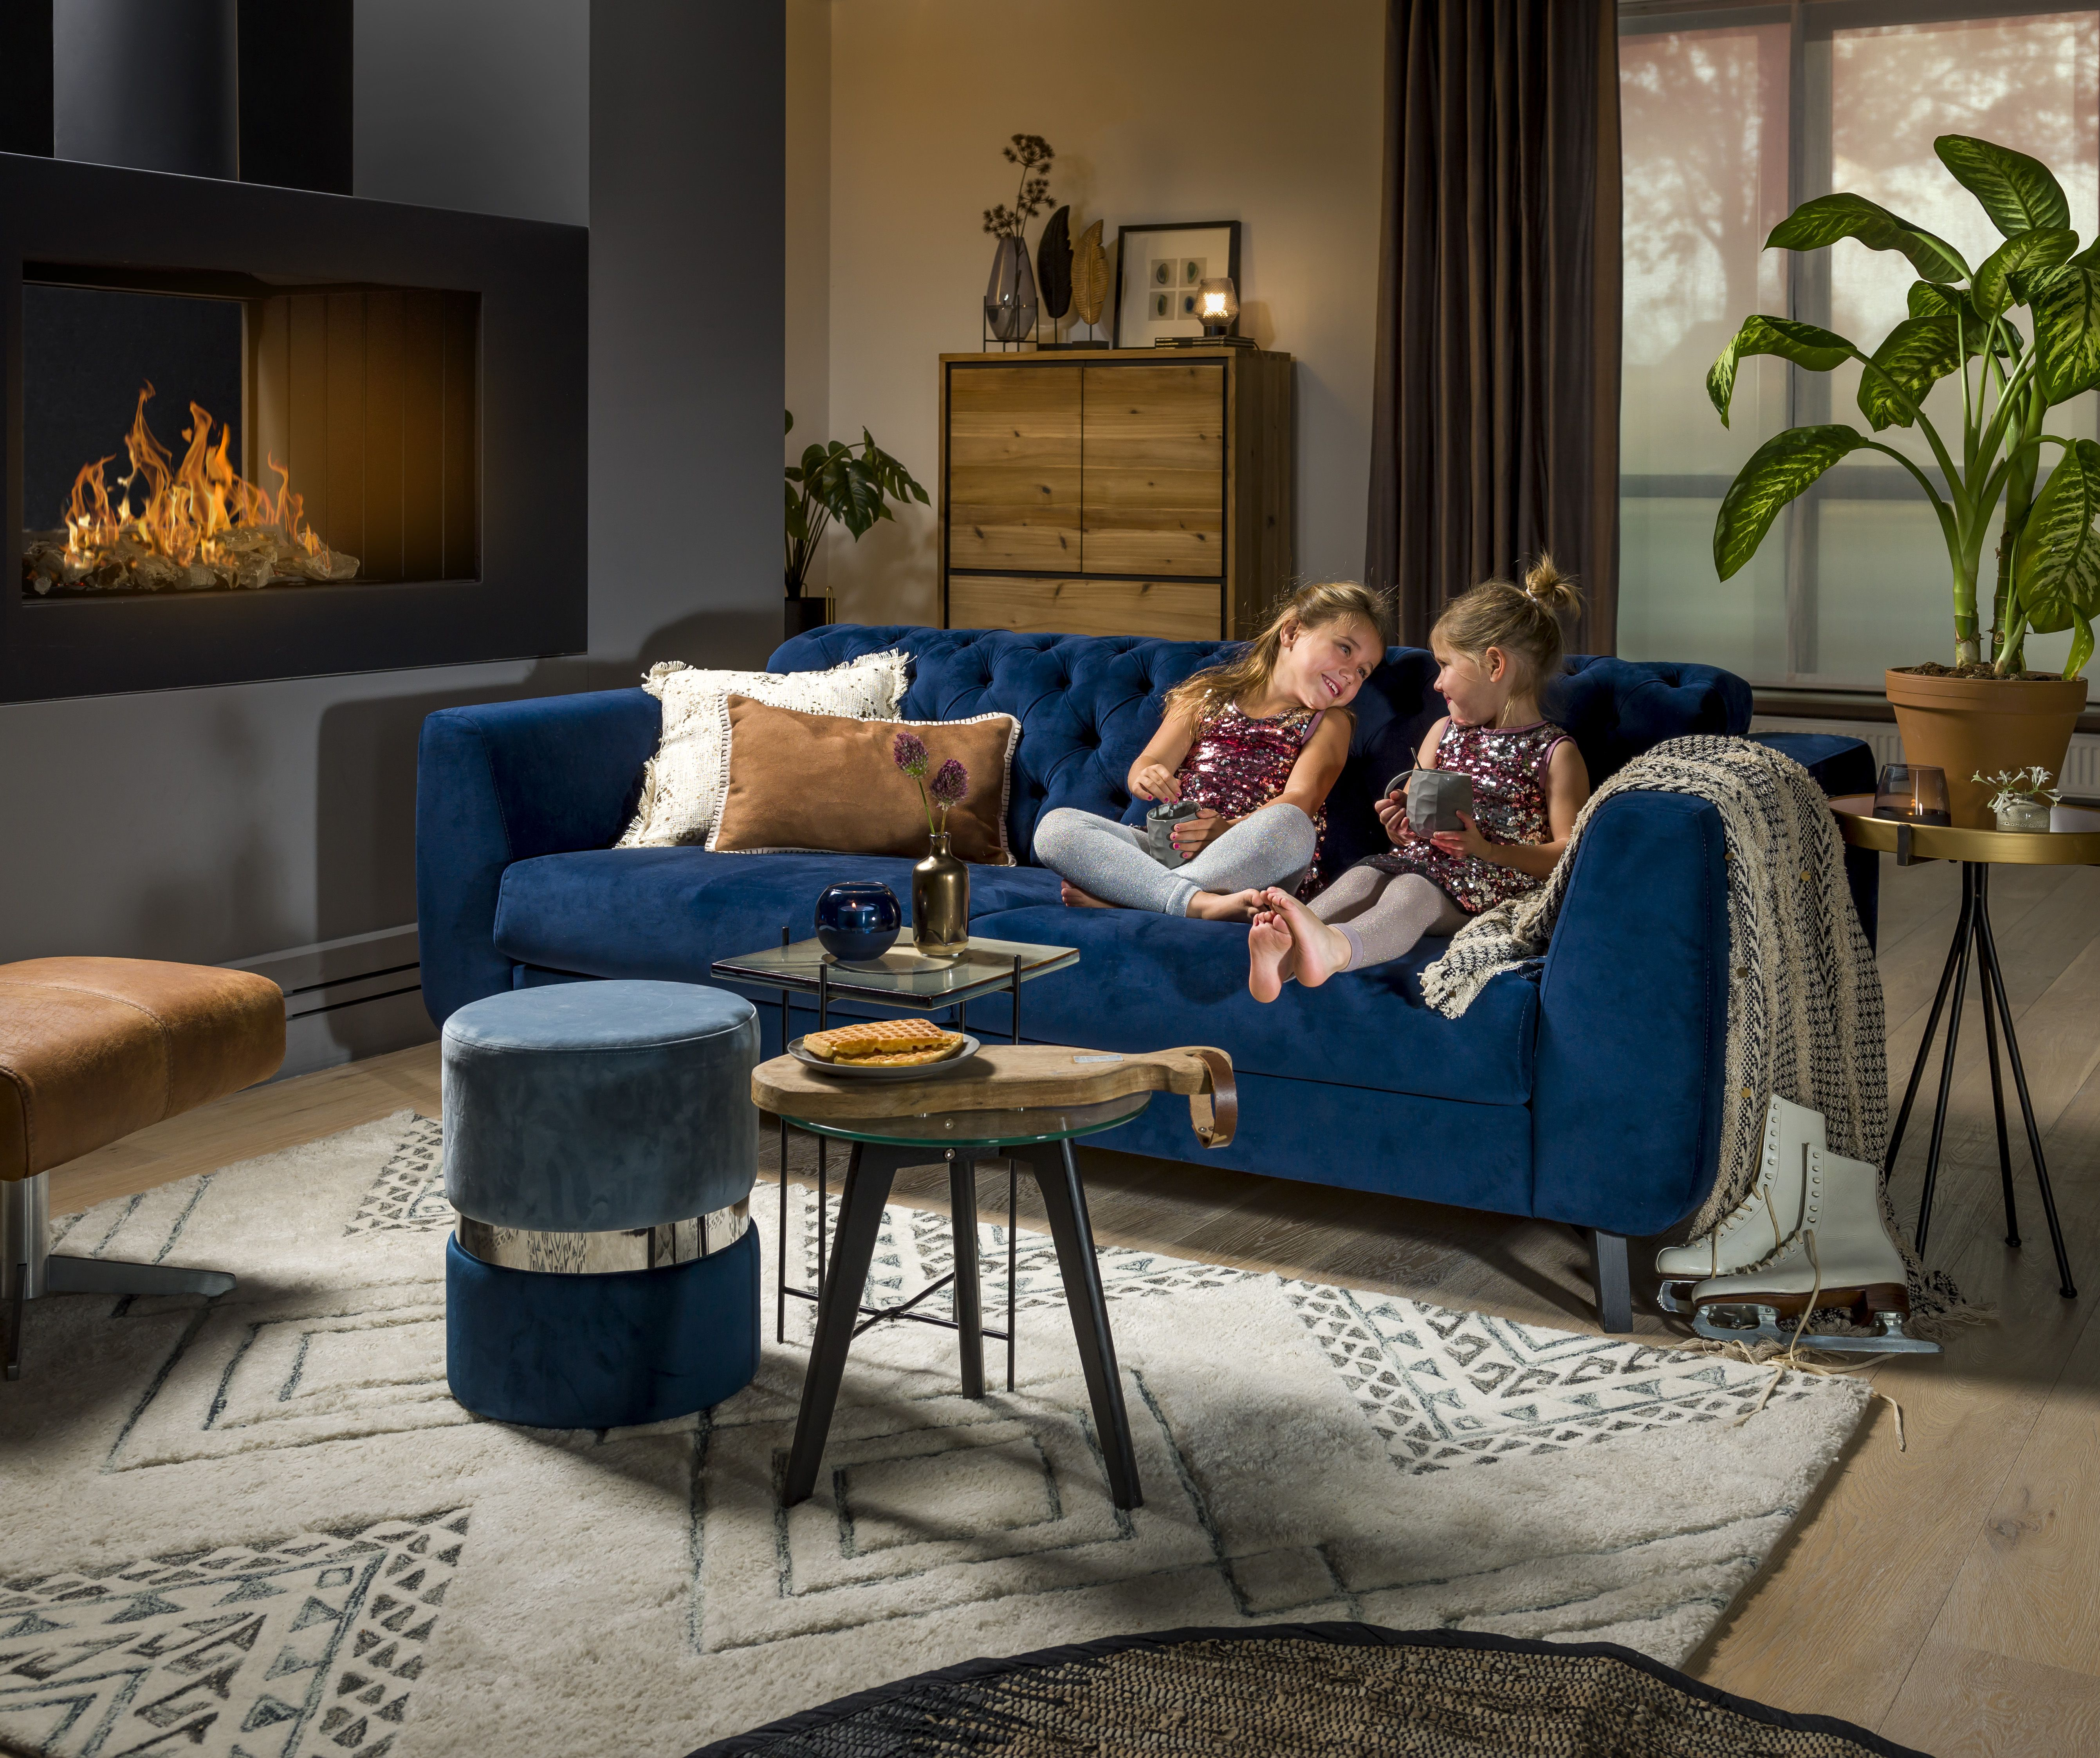 Pin By Abitare Living On Henders Hazel Luxembourg Un Interieur Chaleureux Familial Et Durable Furniture Outdoor Furniture Sets Home Decor